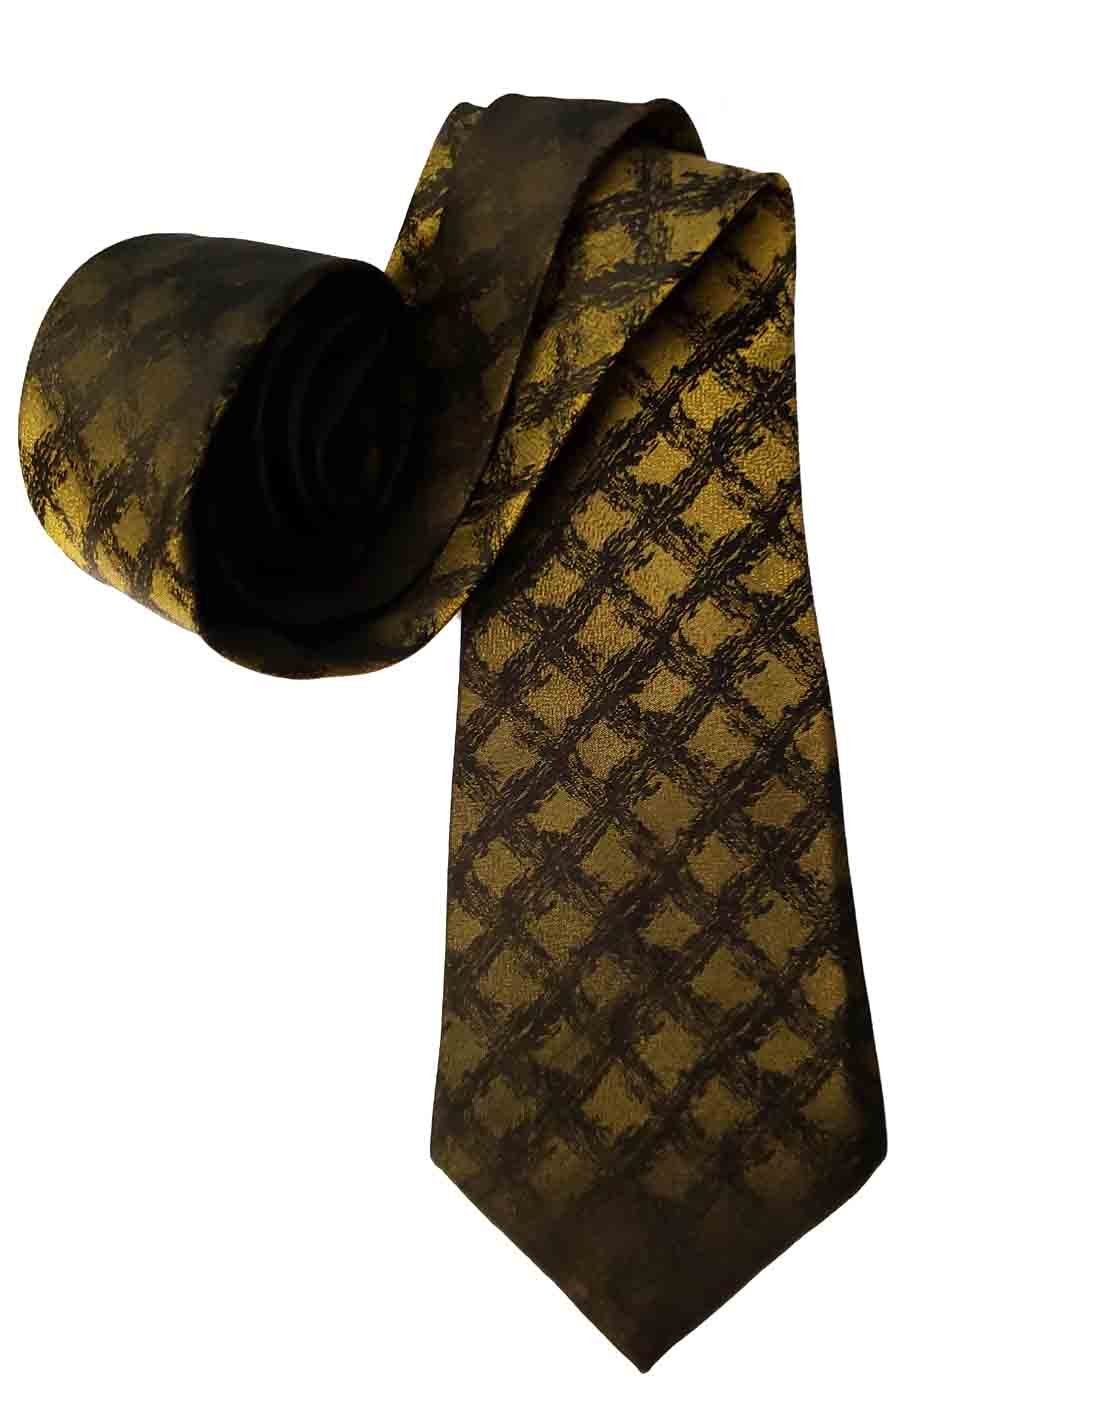 Vintage 1960s Silk Tie Golden Olive Black Lattice Pattern Men's